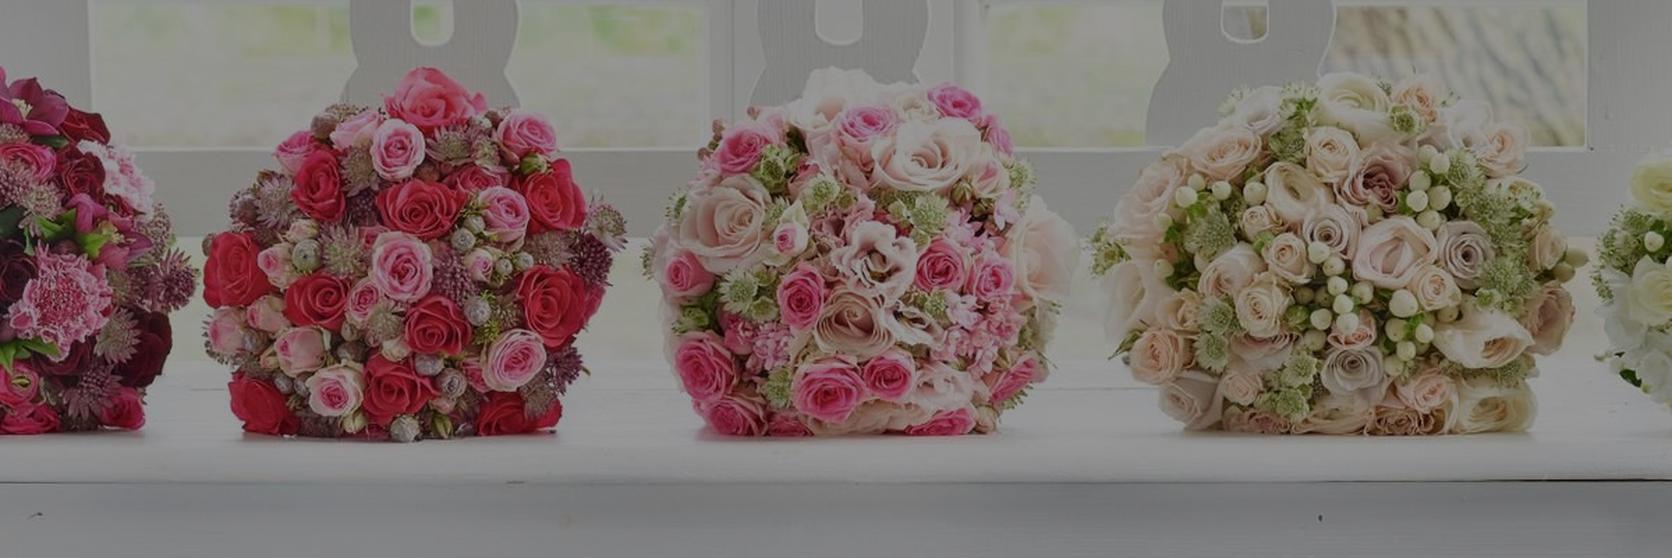 8-beautiful-bridesmaid-bouquets-2